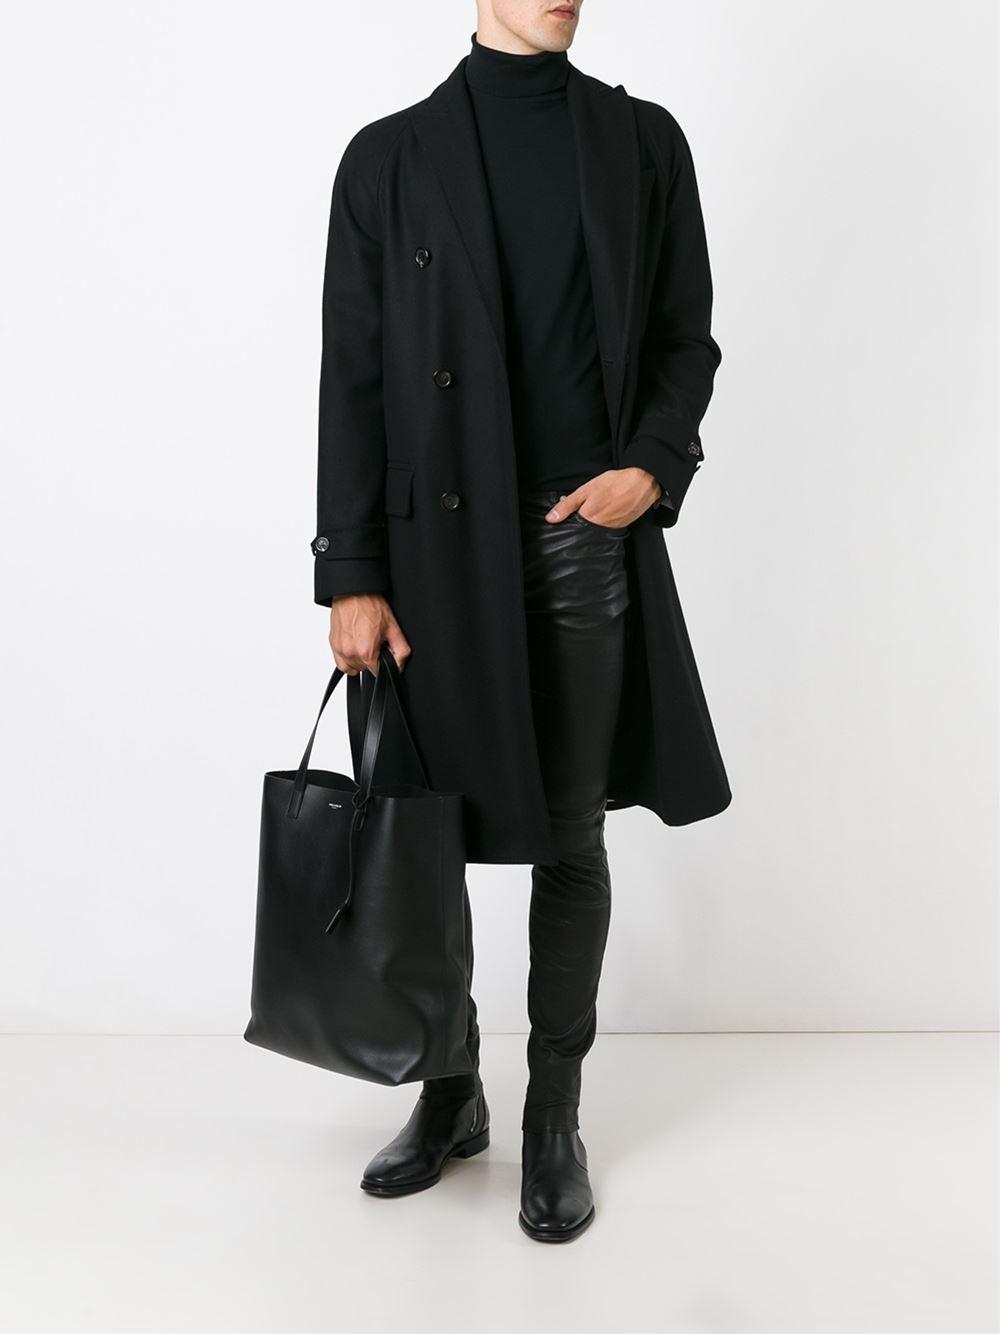 saint laurent classic shopper tote in black for men lyst. Black Bedroom Furniture Sets. Home Design Ideas